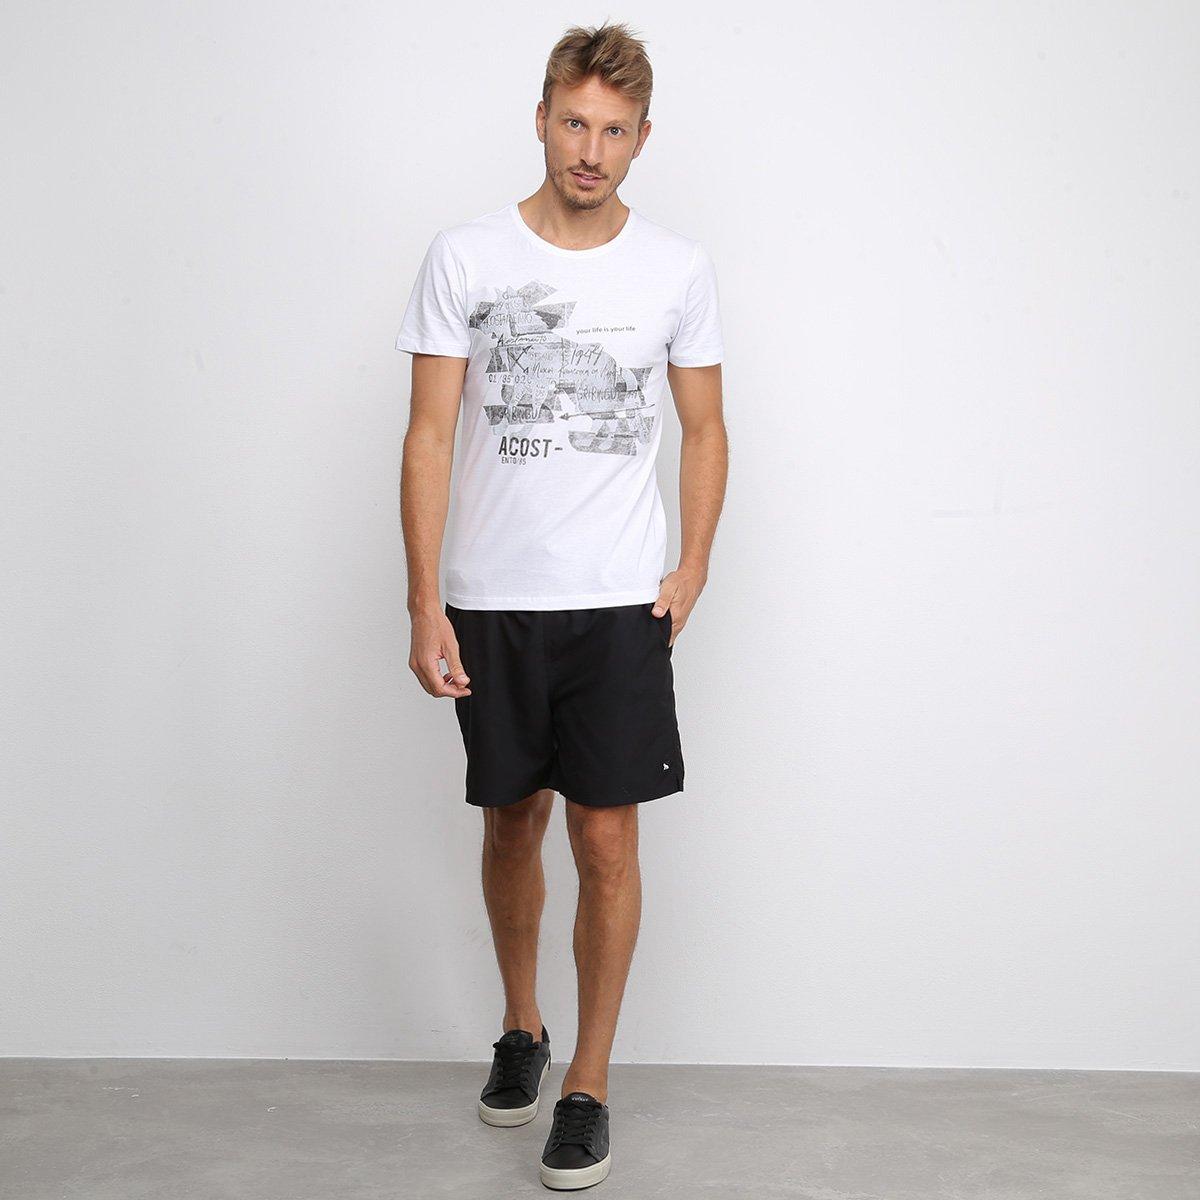 Camiseta Acostamento Estampada Manga Curta Masculina - Branco